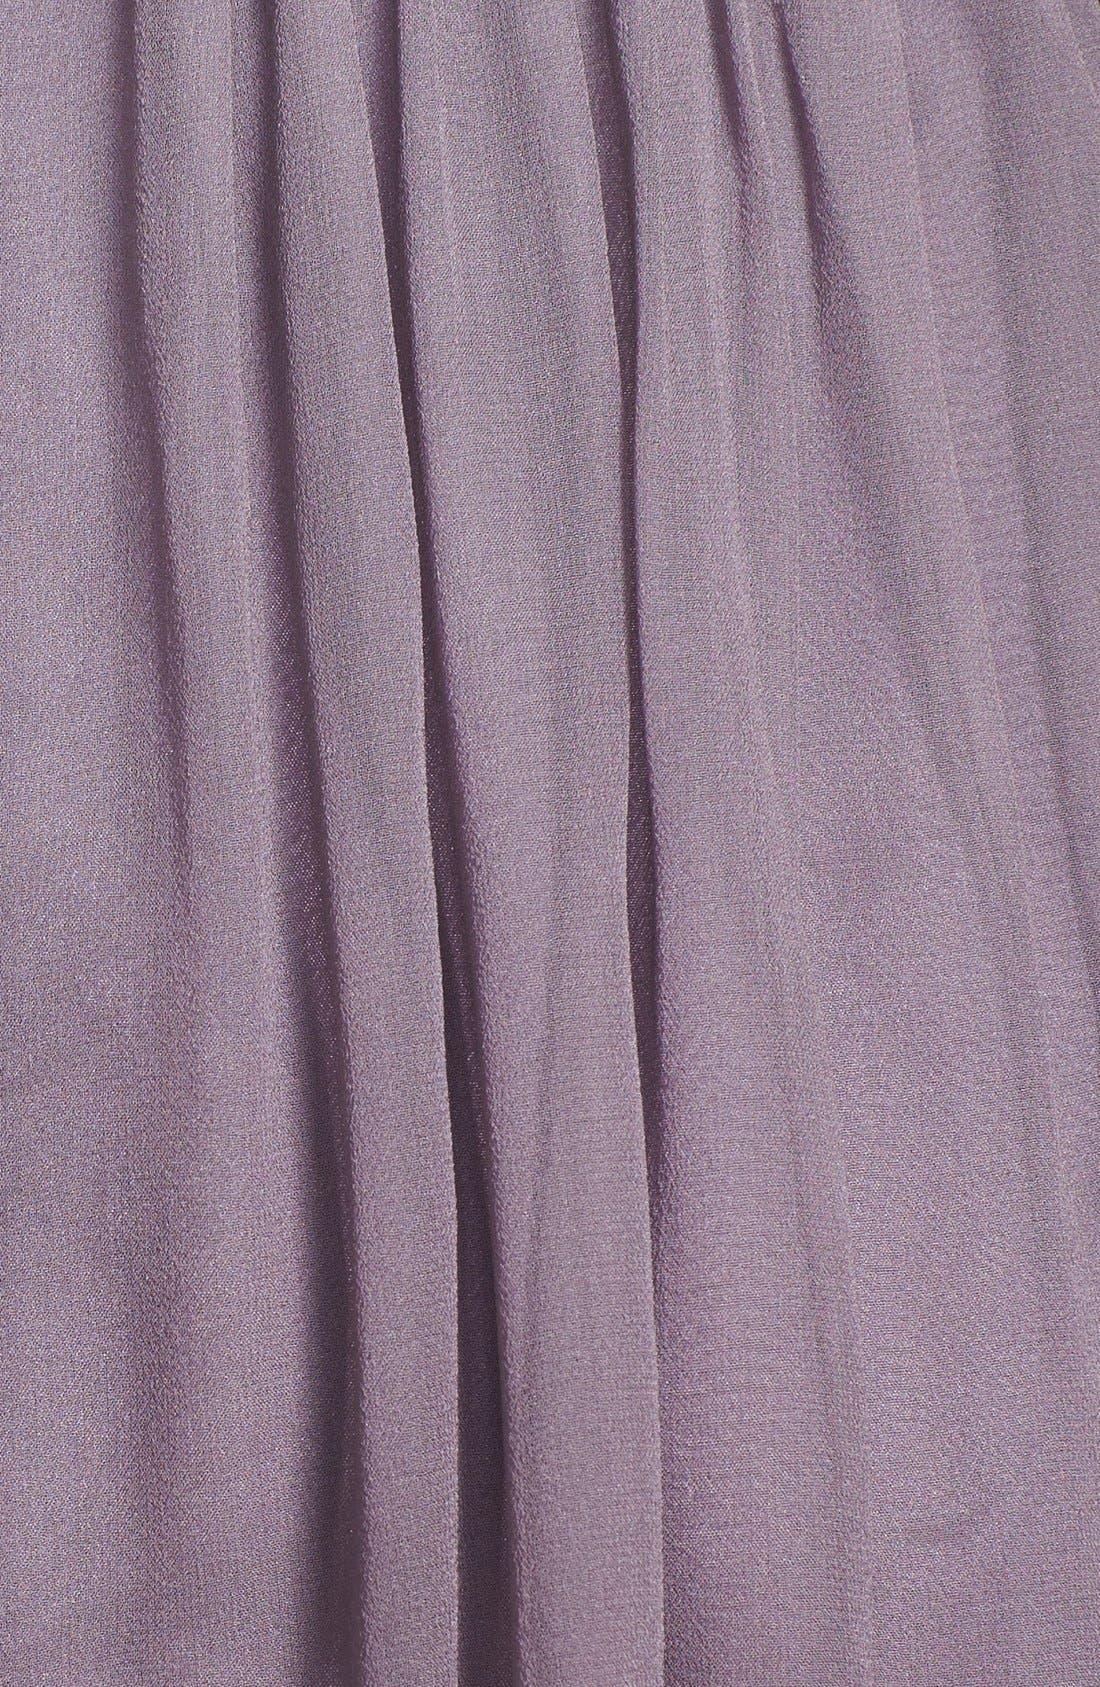 'Morgan' Strapless Silk Chiffon Dress,                             Alternate thumbnail 102, color,